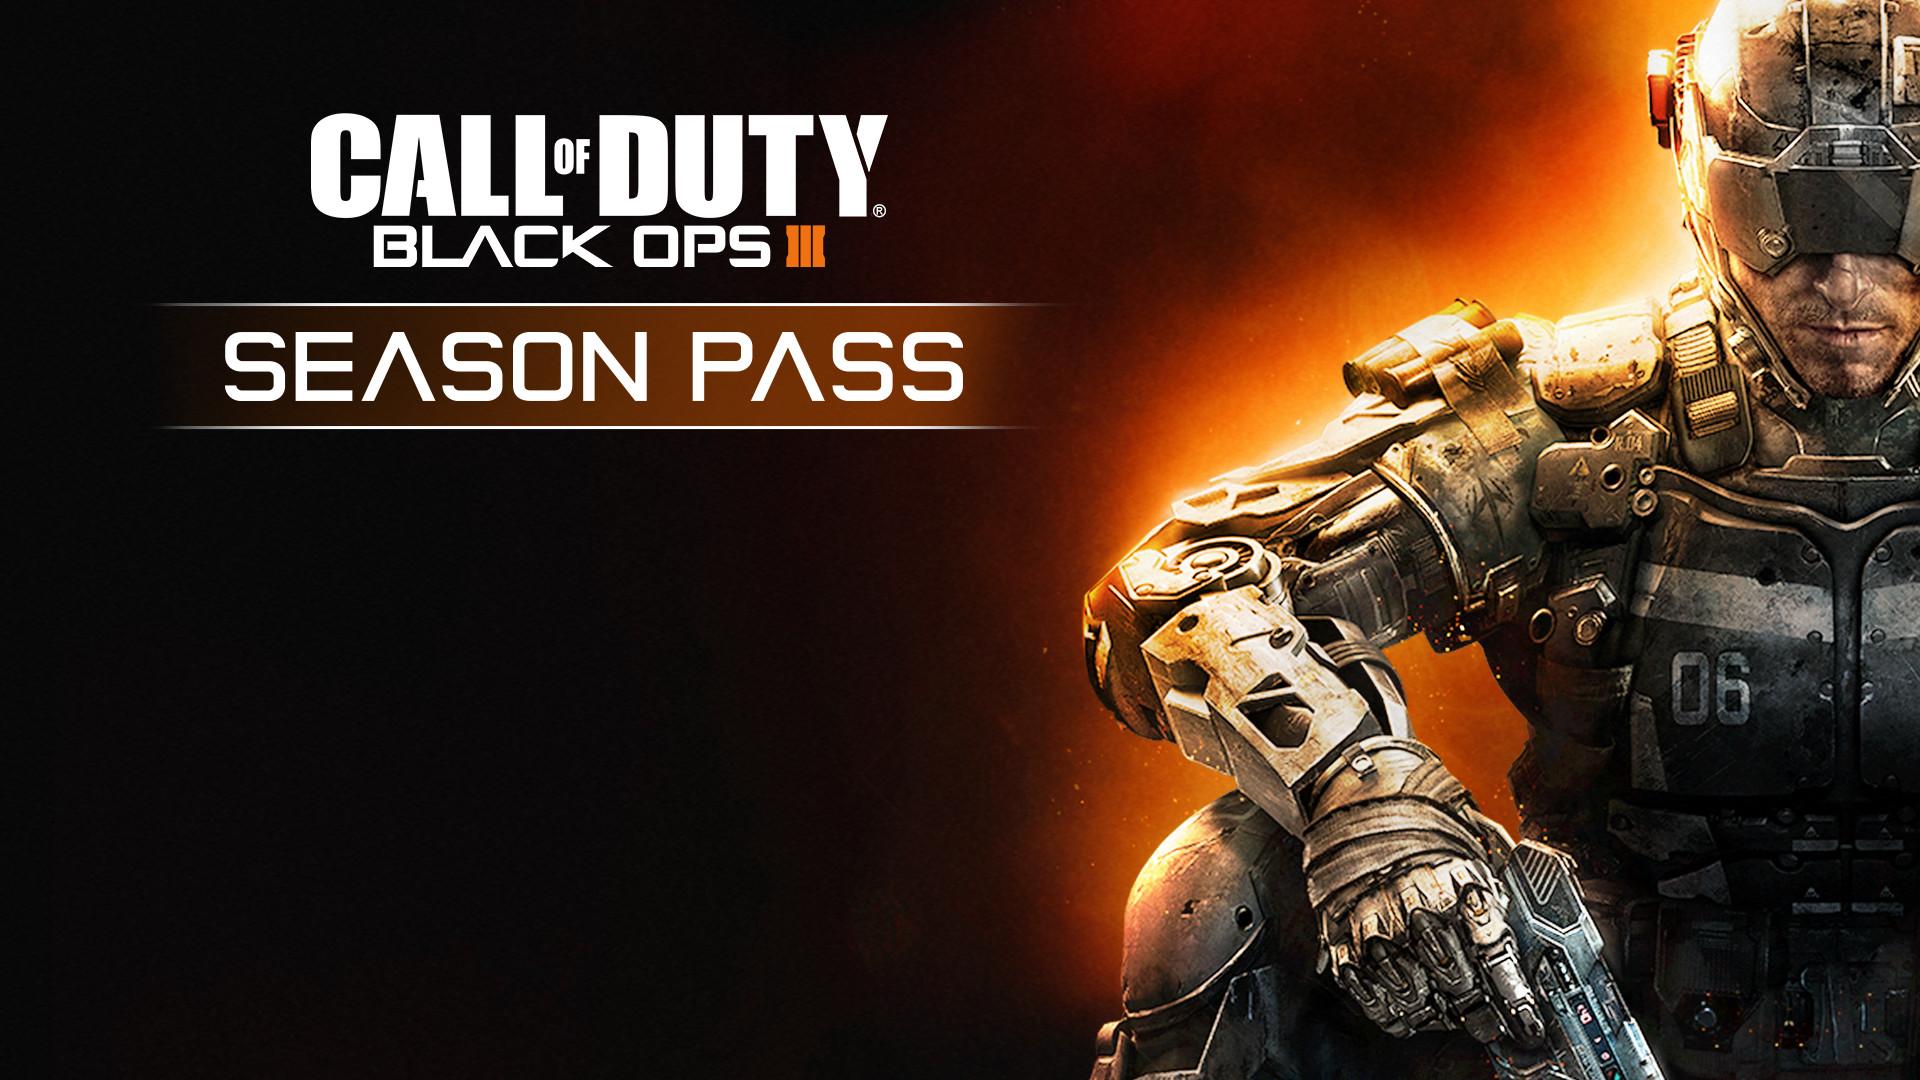 Call Of Duty Black Ops Iii Season Pass On Steam